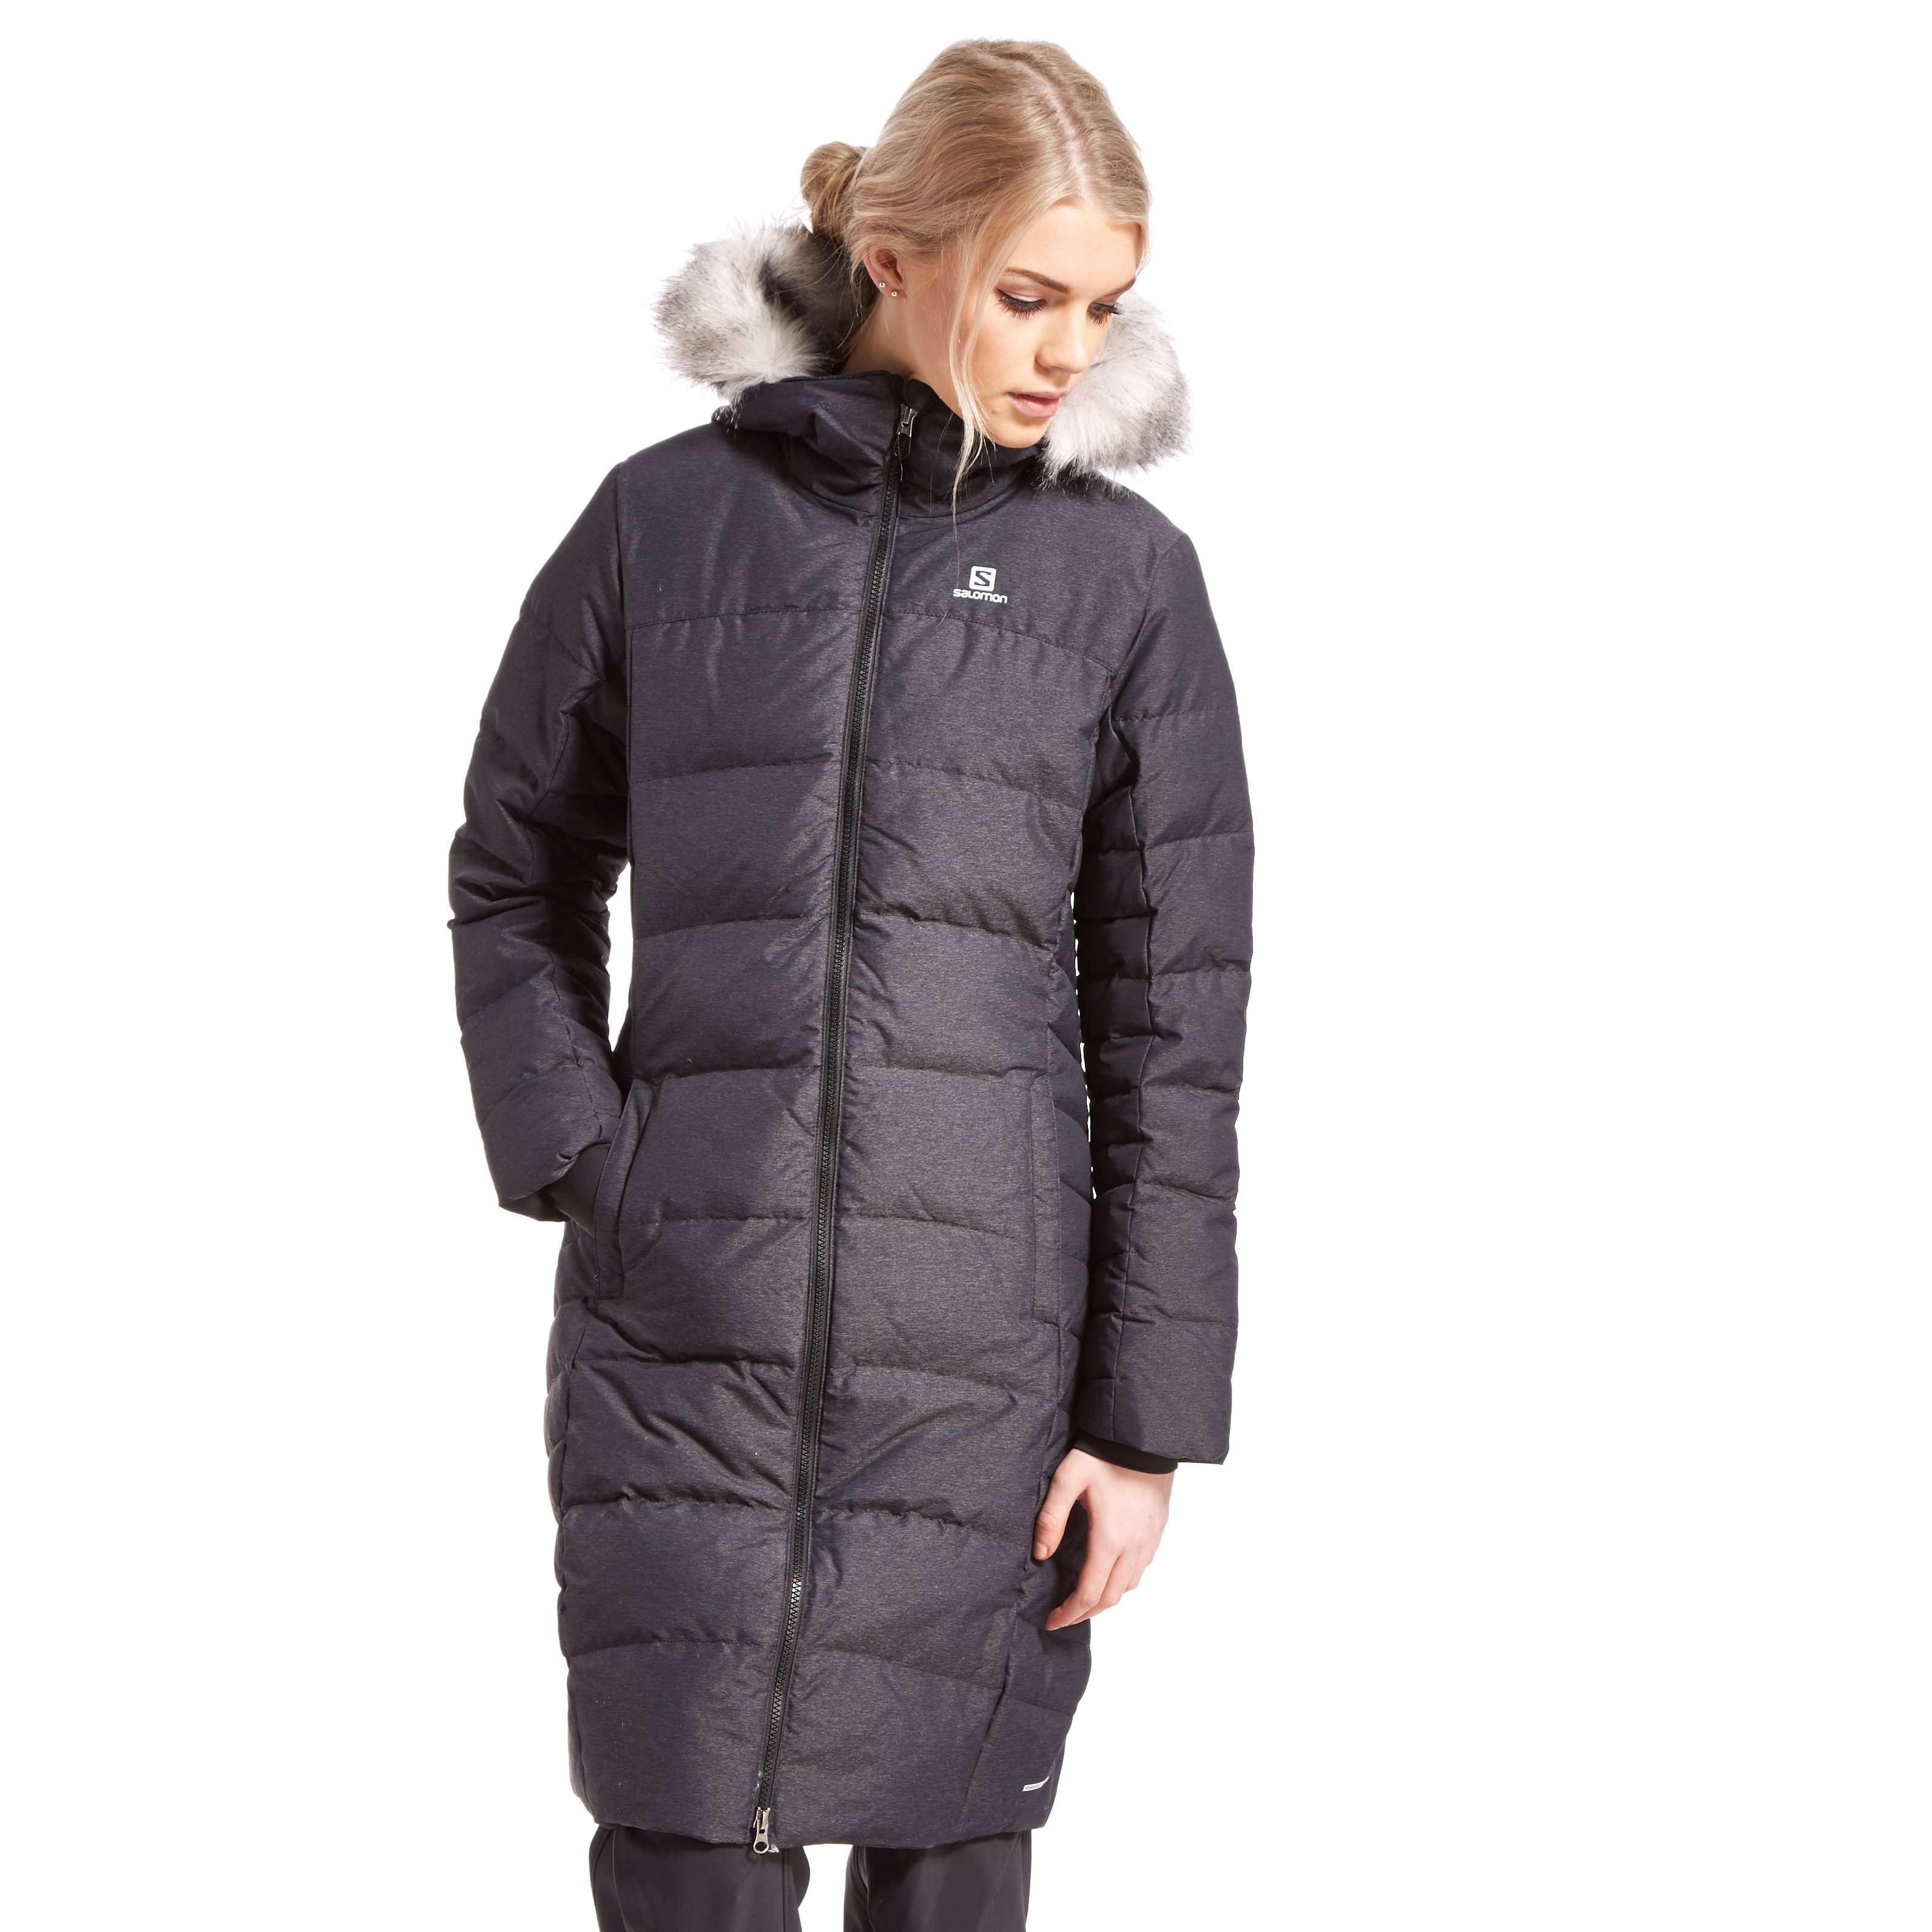 Long Down Filled Winter Coats - JacketIn